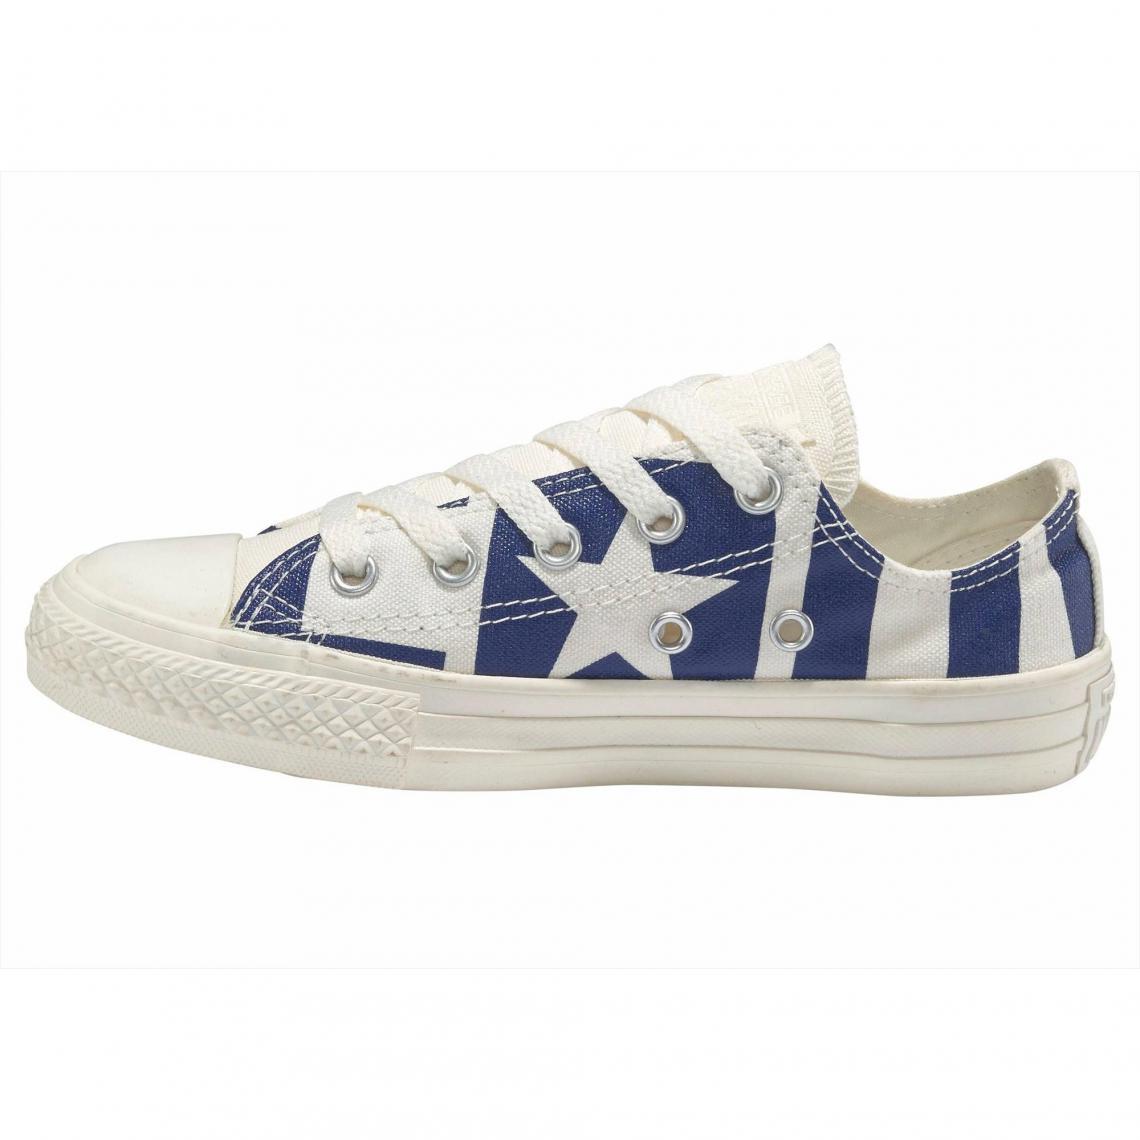 Chaussures Basses Fille Converse Chuck Taylor All Star Bleu